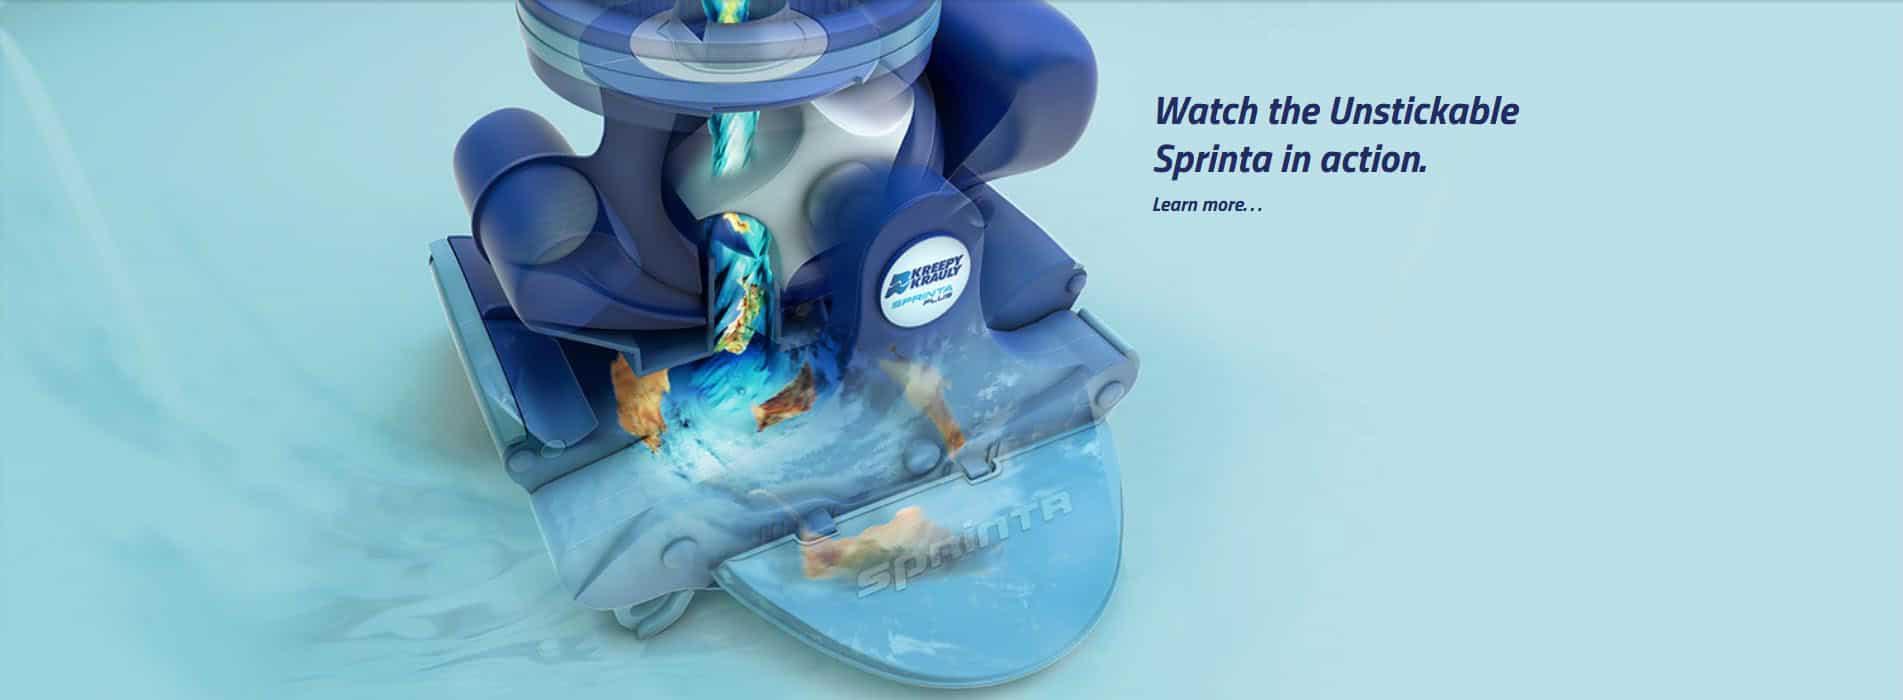 Sprinta Plus Pool Cleaner Australia Banner